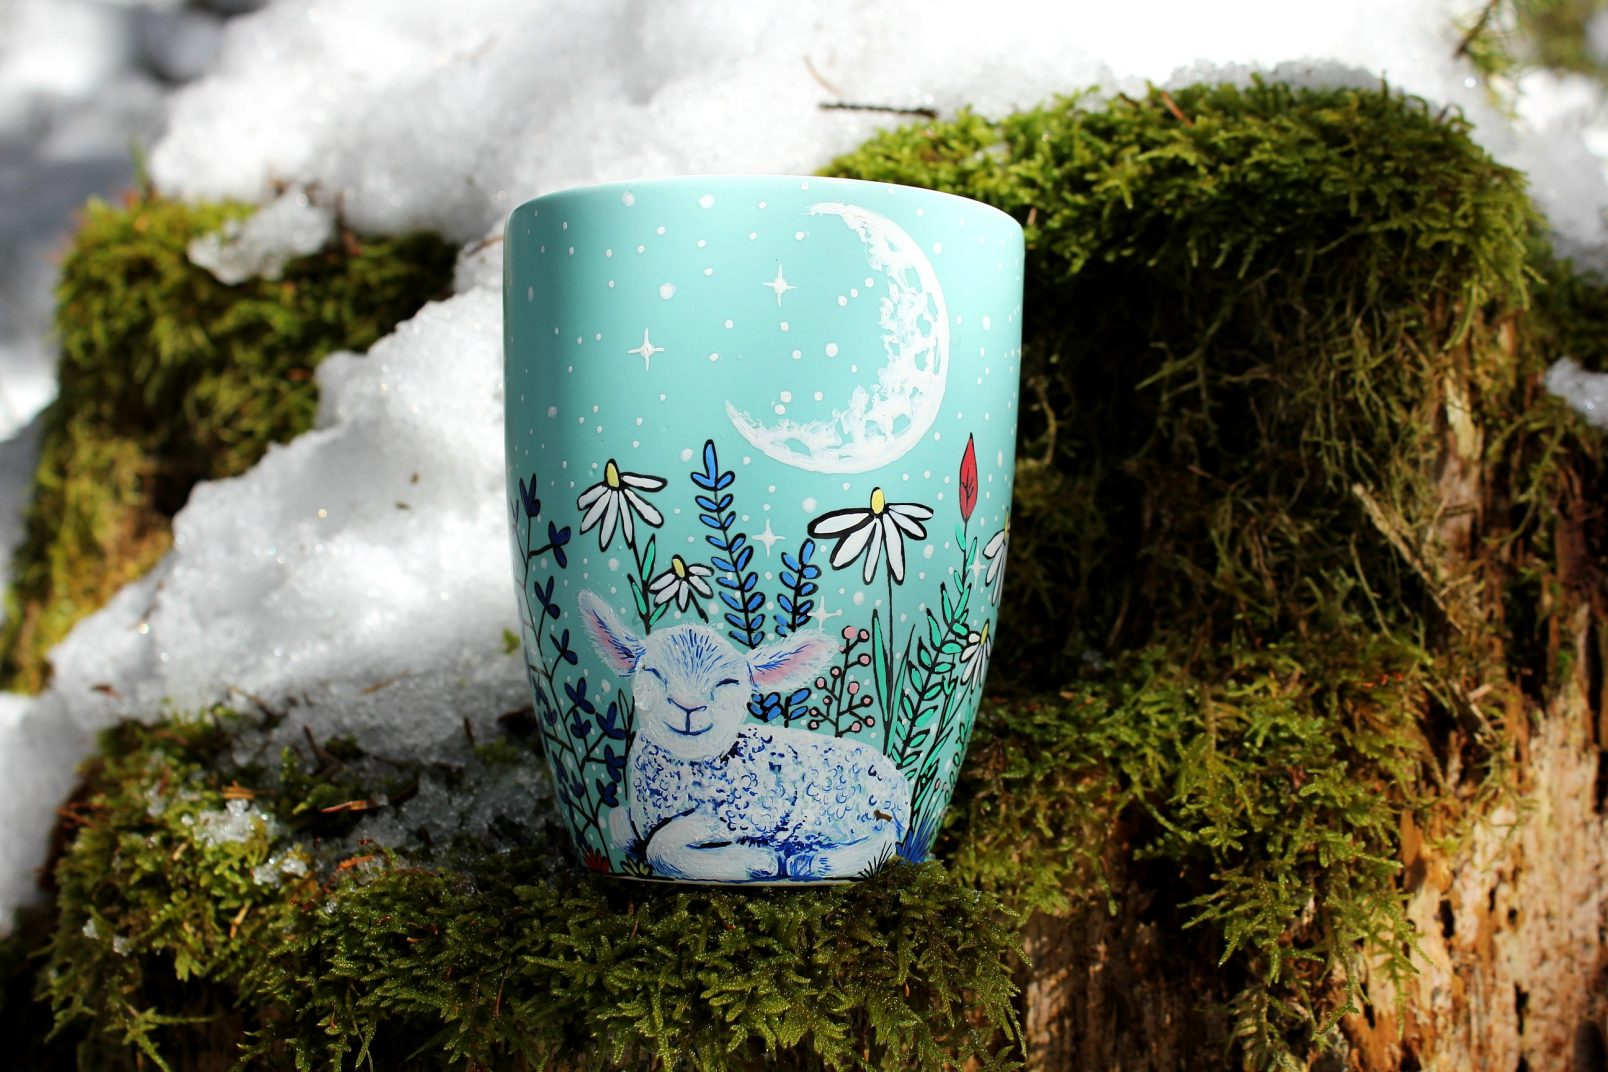 sheep mug art etsy store online store hand painted illustration handmase gift mug coffe tea mug cup tourquoise matte coffe mug meadow flowers grass sheep illustration mug